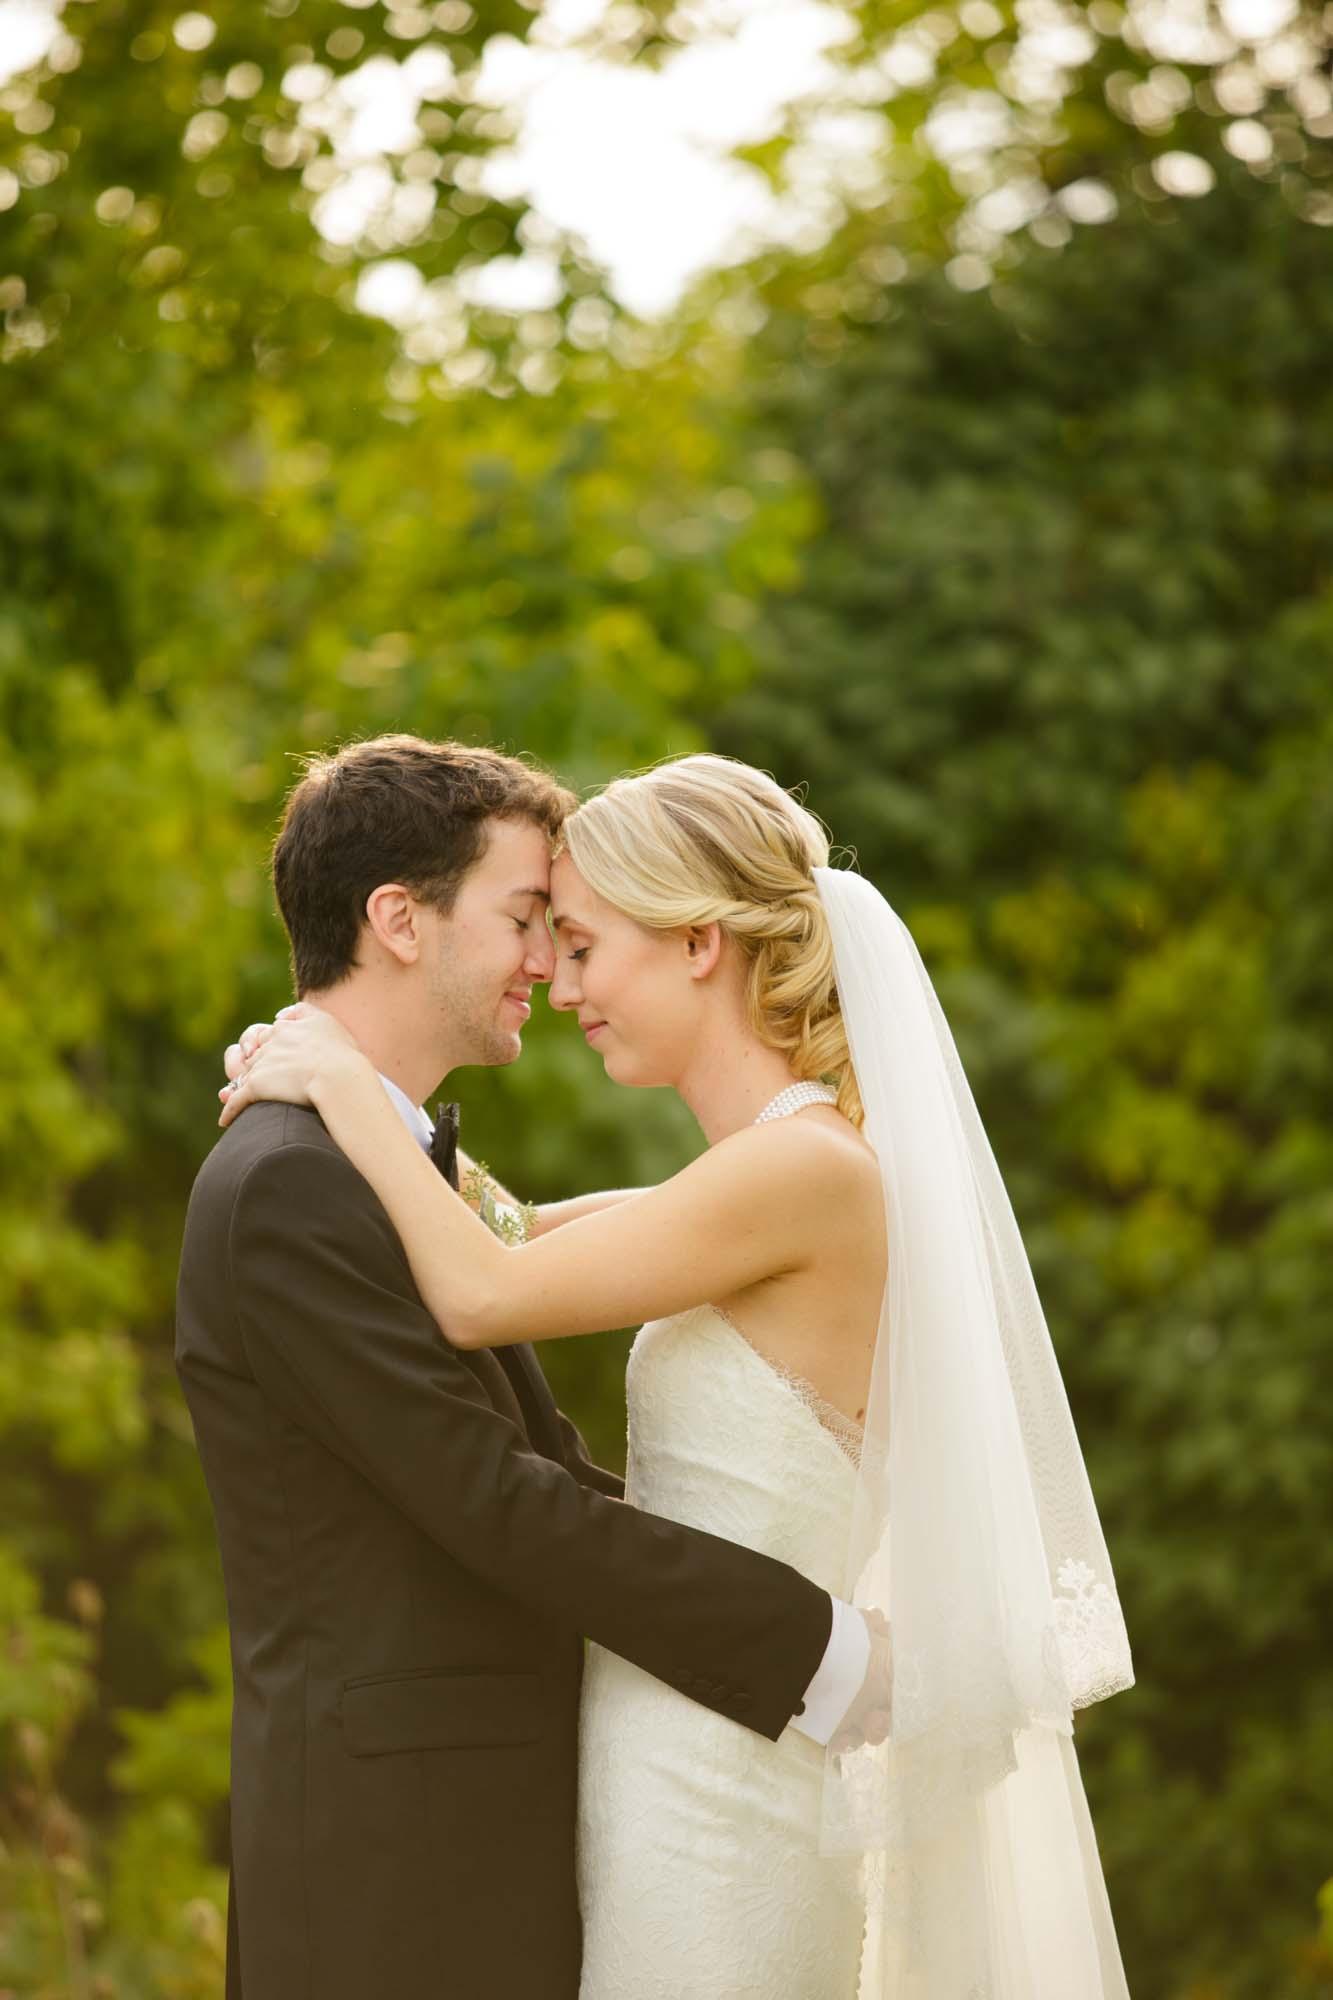 Congratulations Sarah and Daniel!